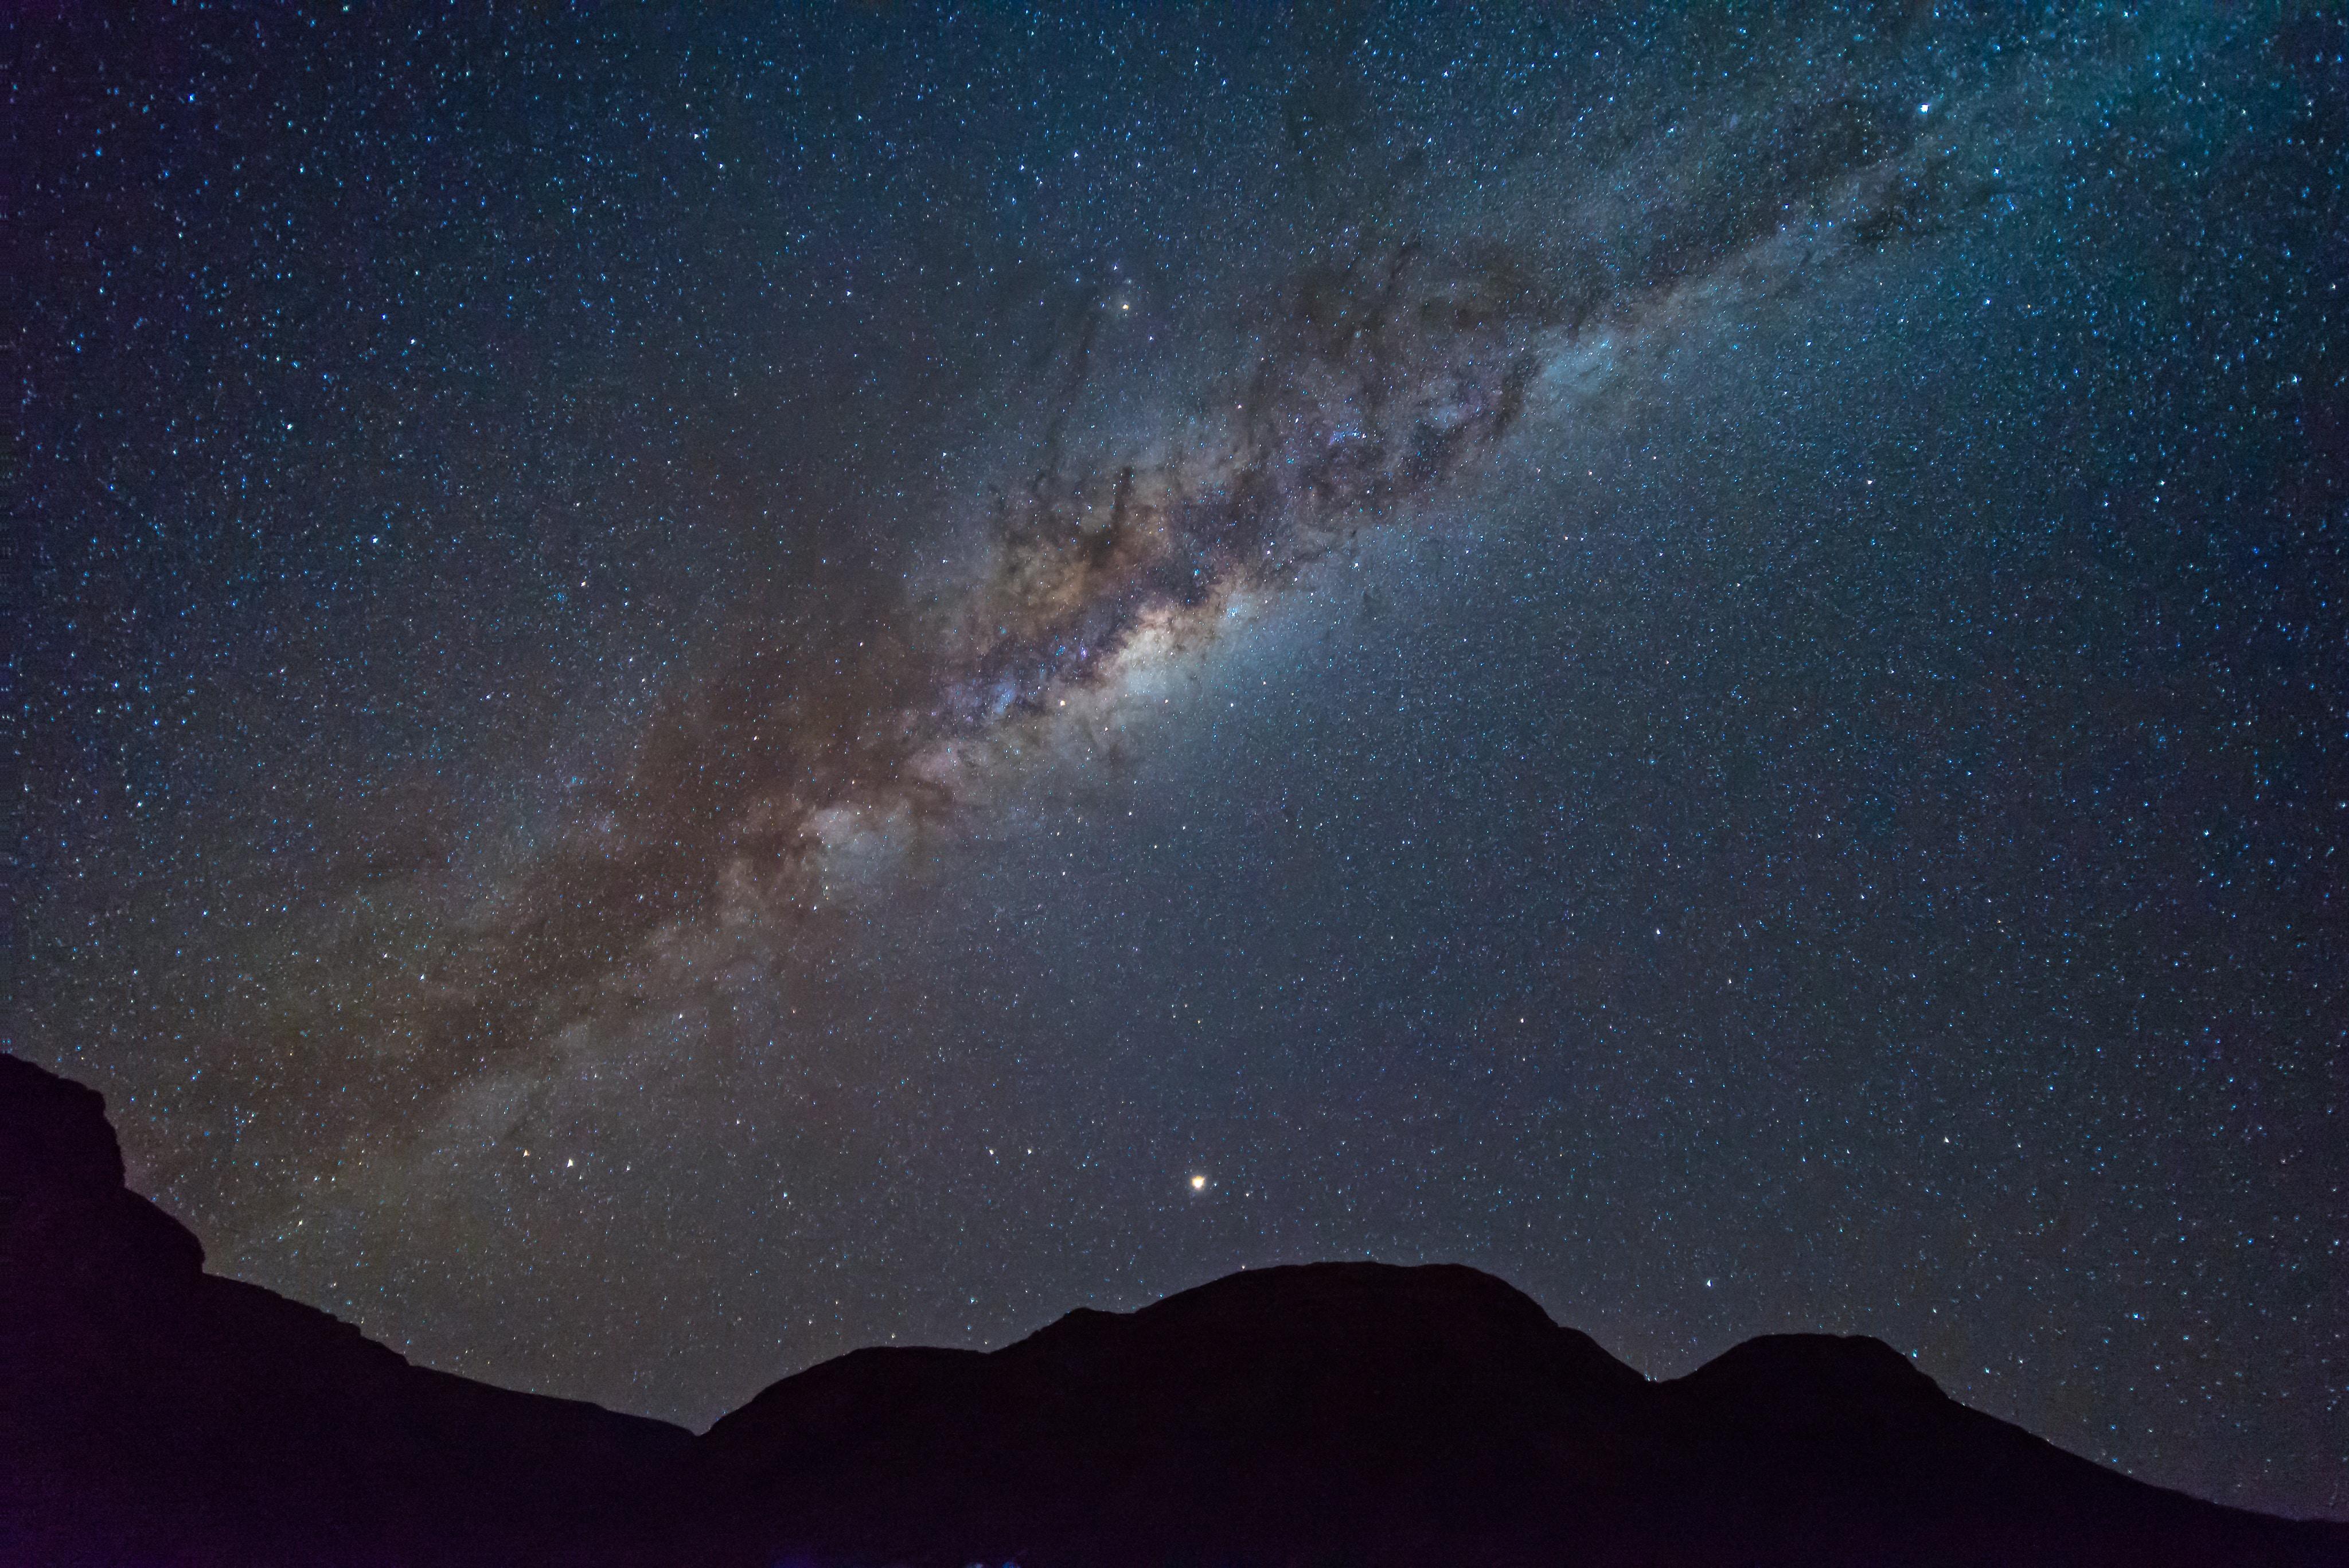 silhouette photograph of mountain under nebula night sky